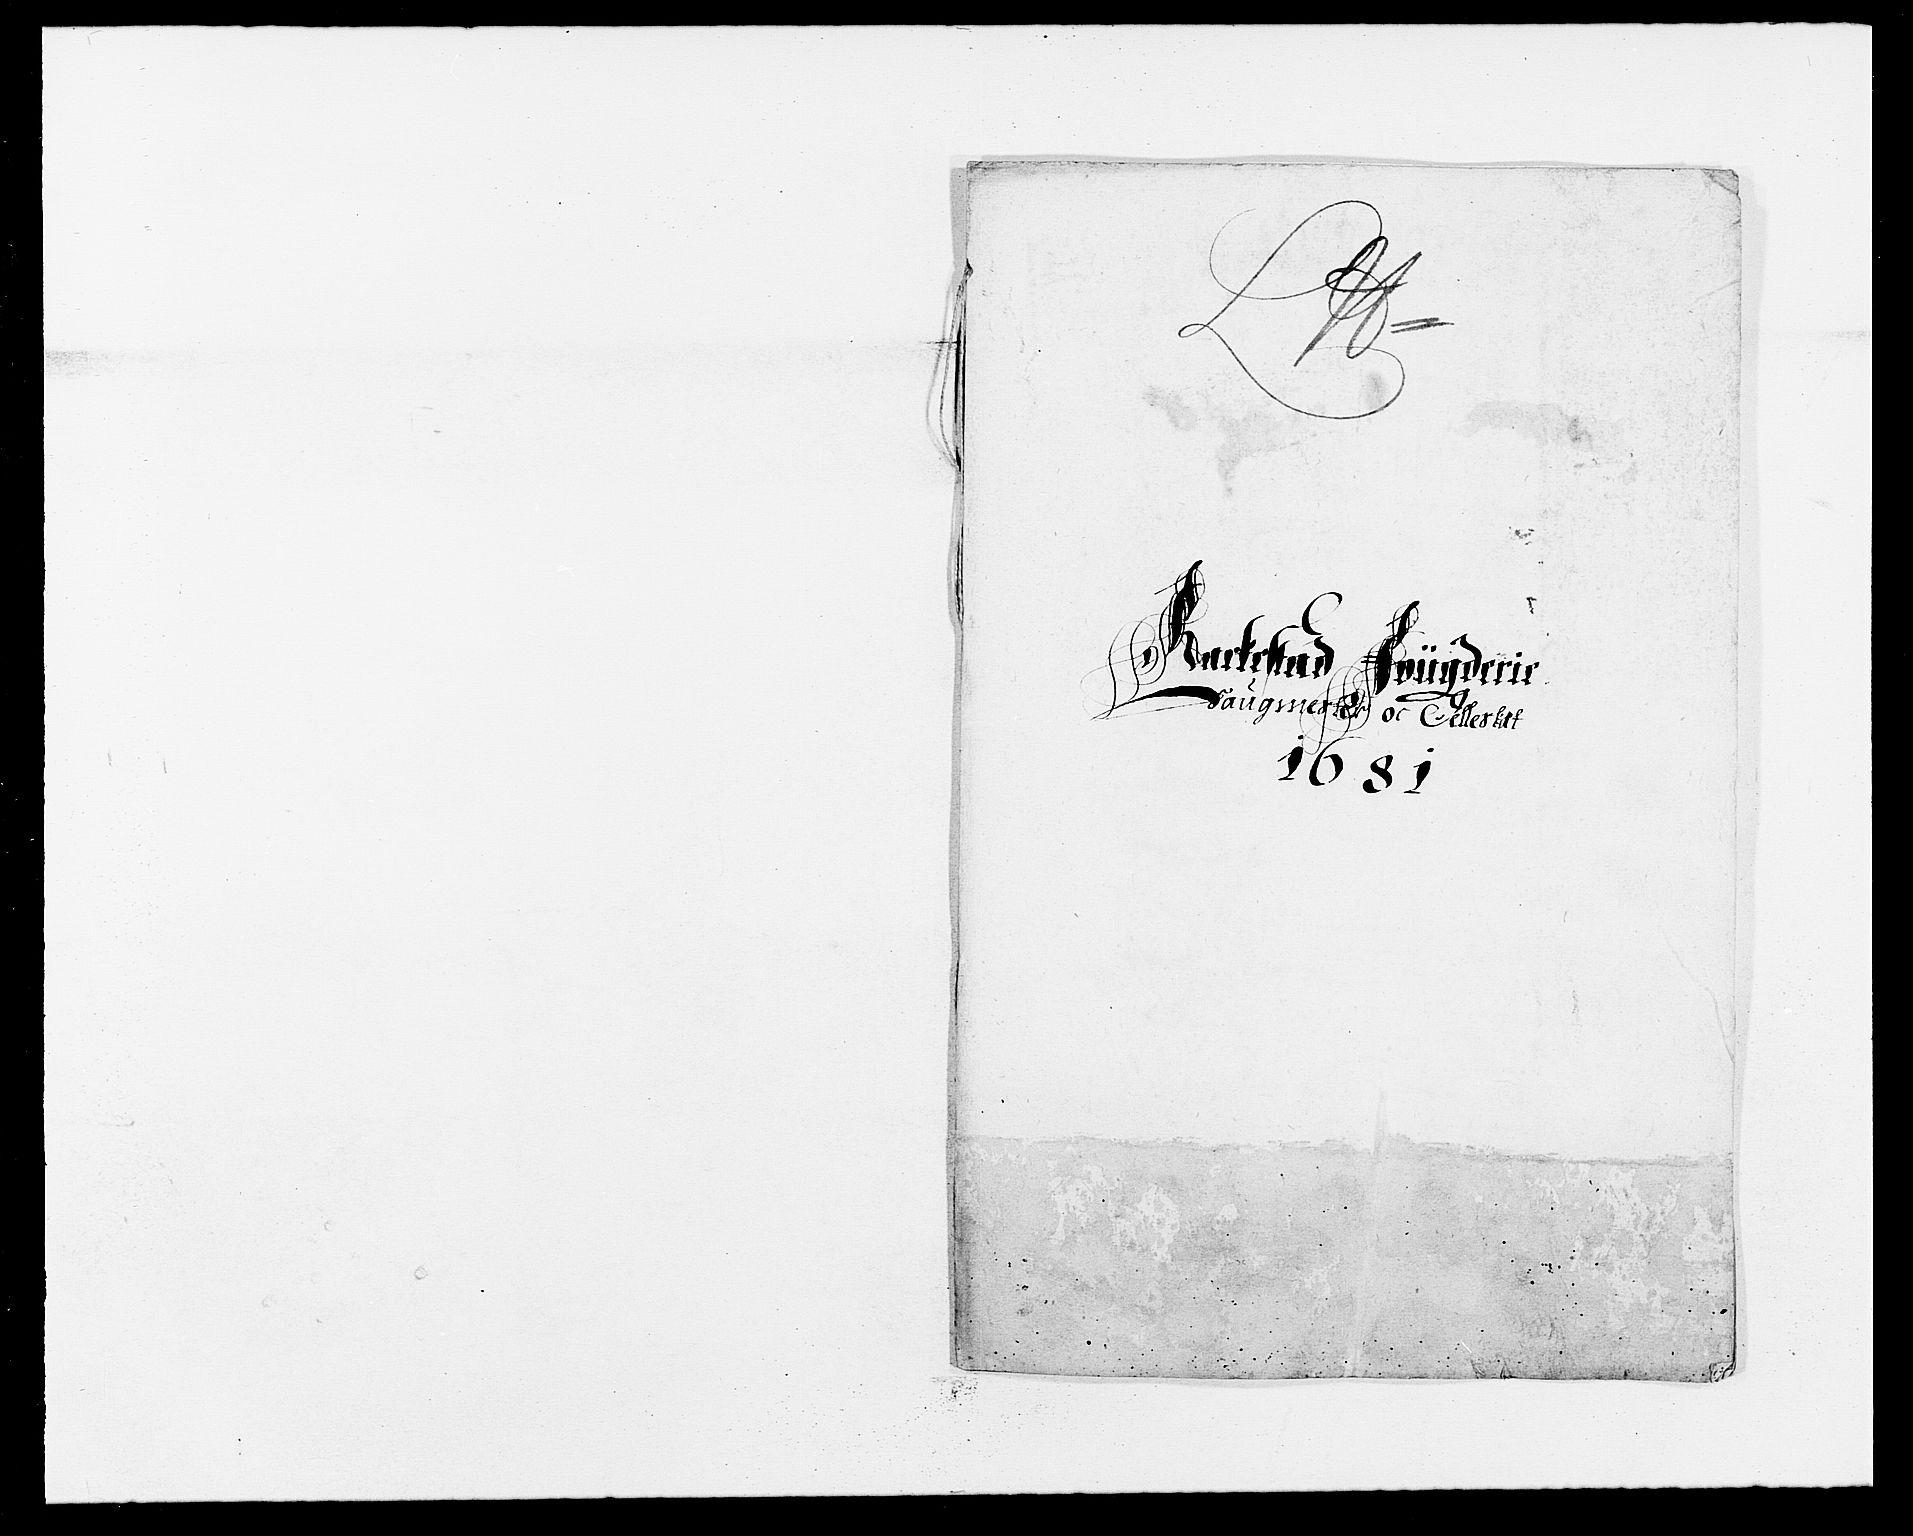 RA, Rentekammeret inntil 1814, Reviderte regnskaper, Fogderegnskap, R05/L0272: Fogderegnskap Rakkestad, 1680-1681, s. 376